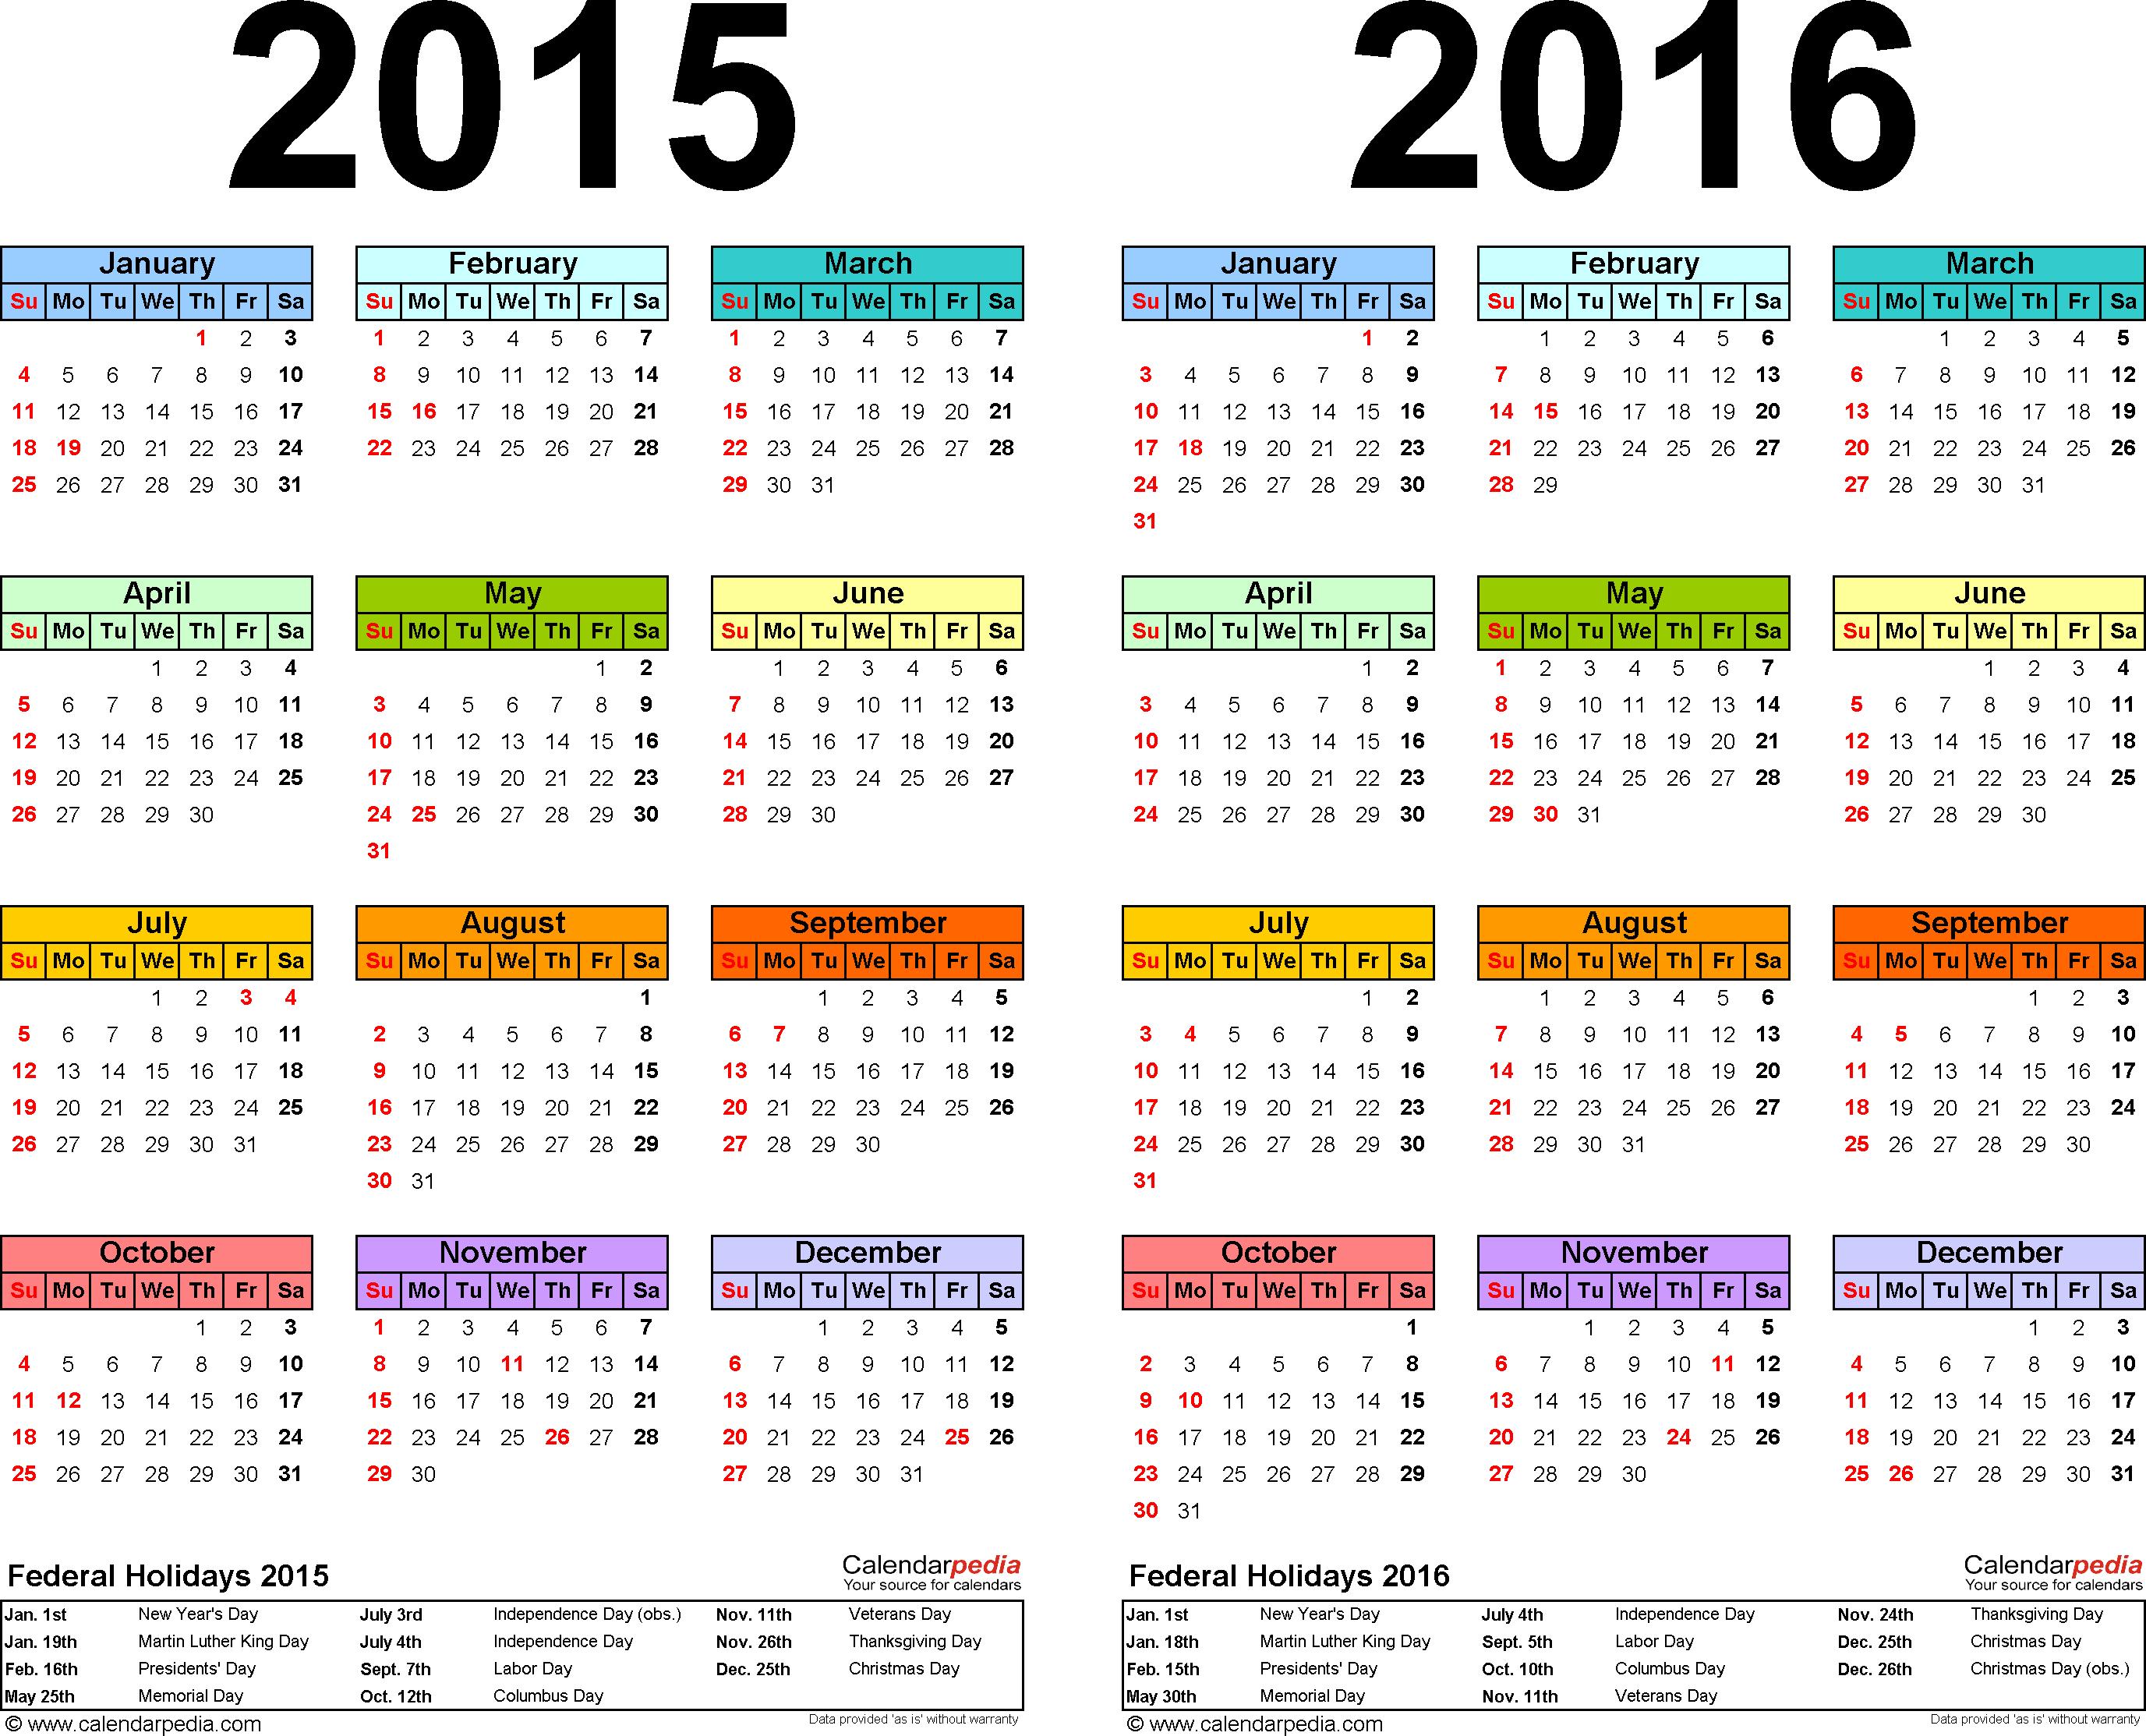 2015 Full Year Calendar - Wpa.wpart.co